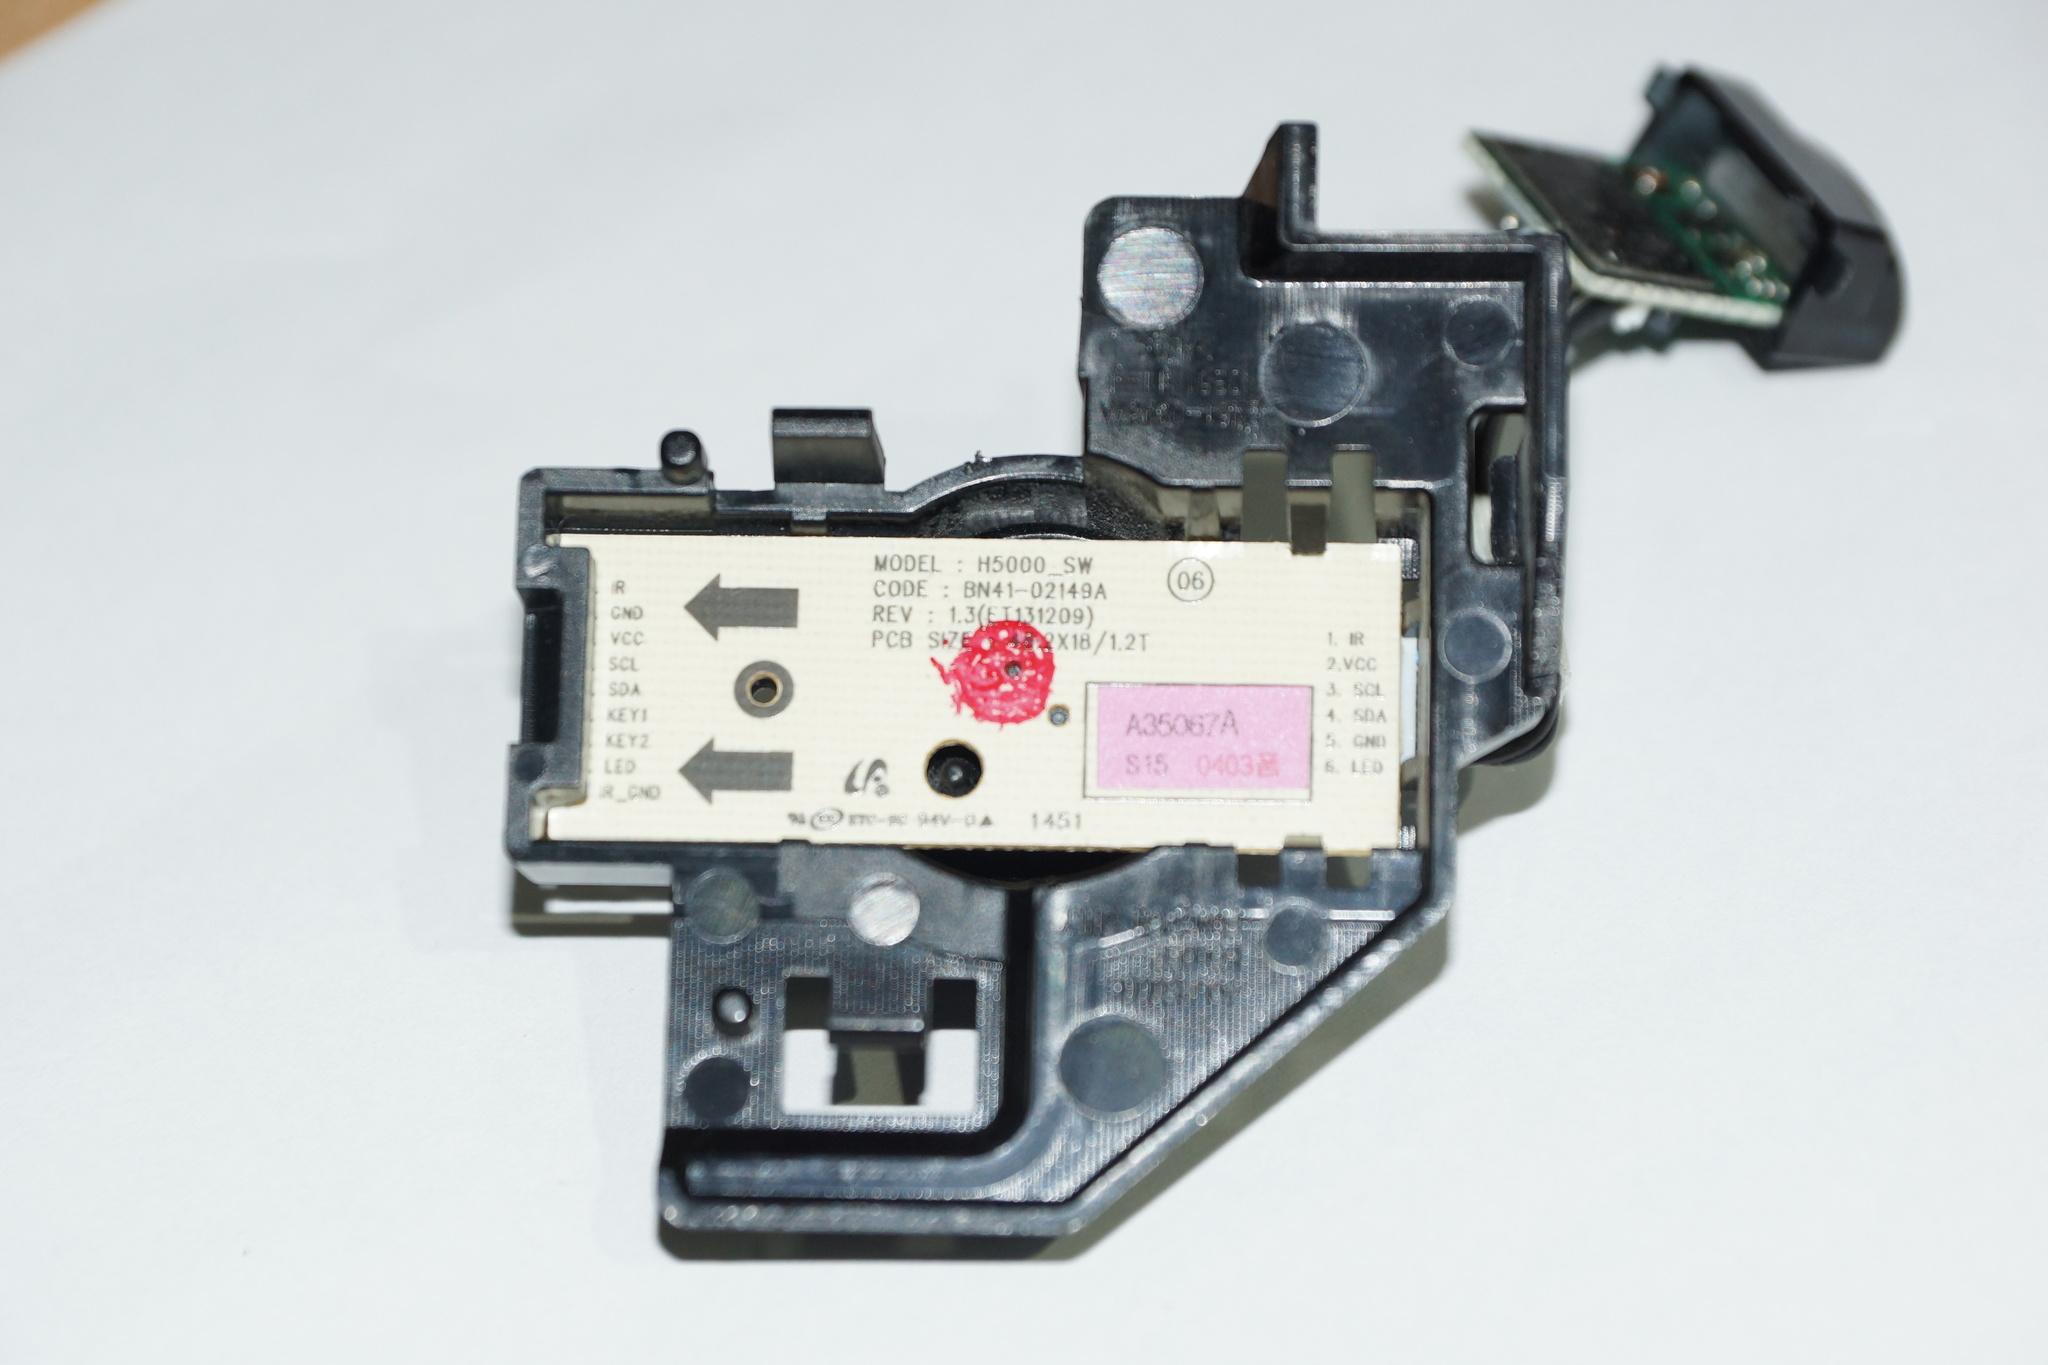 BN41-02149A H5000_SW кнопка-джойстик телевизора Samsung